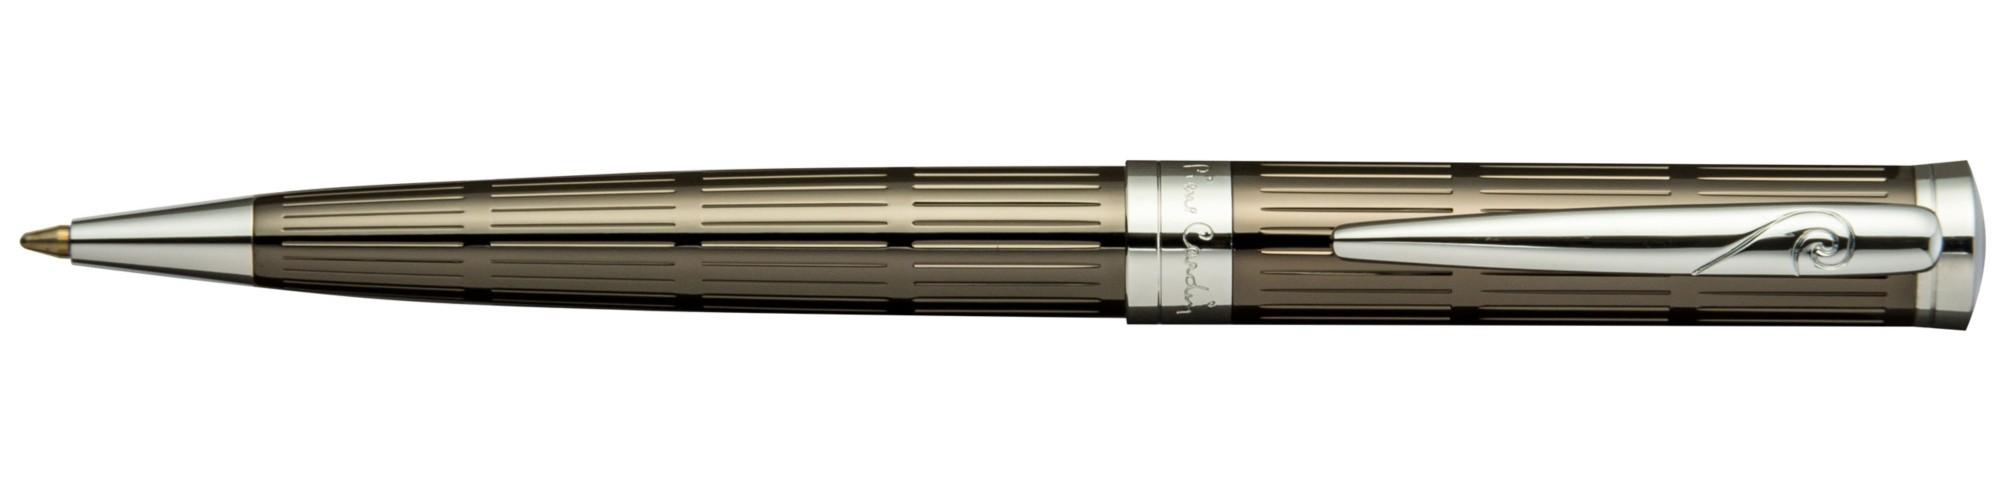 Хромовая шариковая ручка Pierre Cardin Avantage